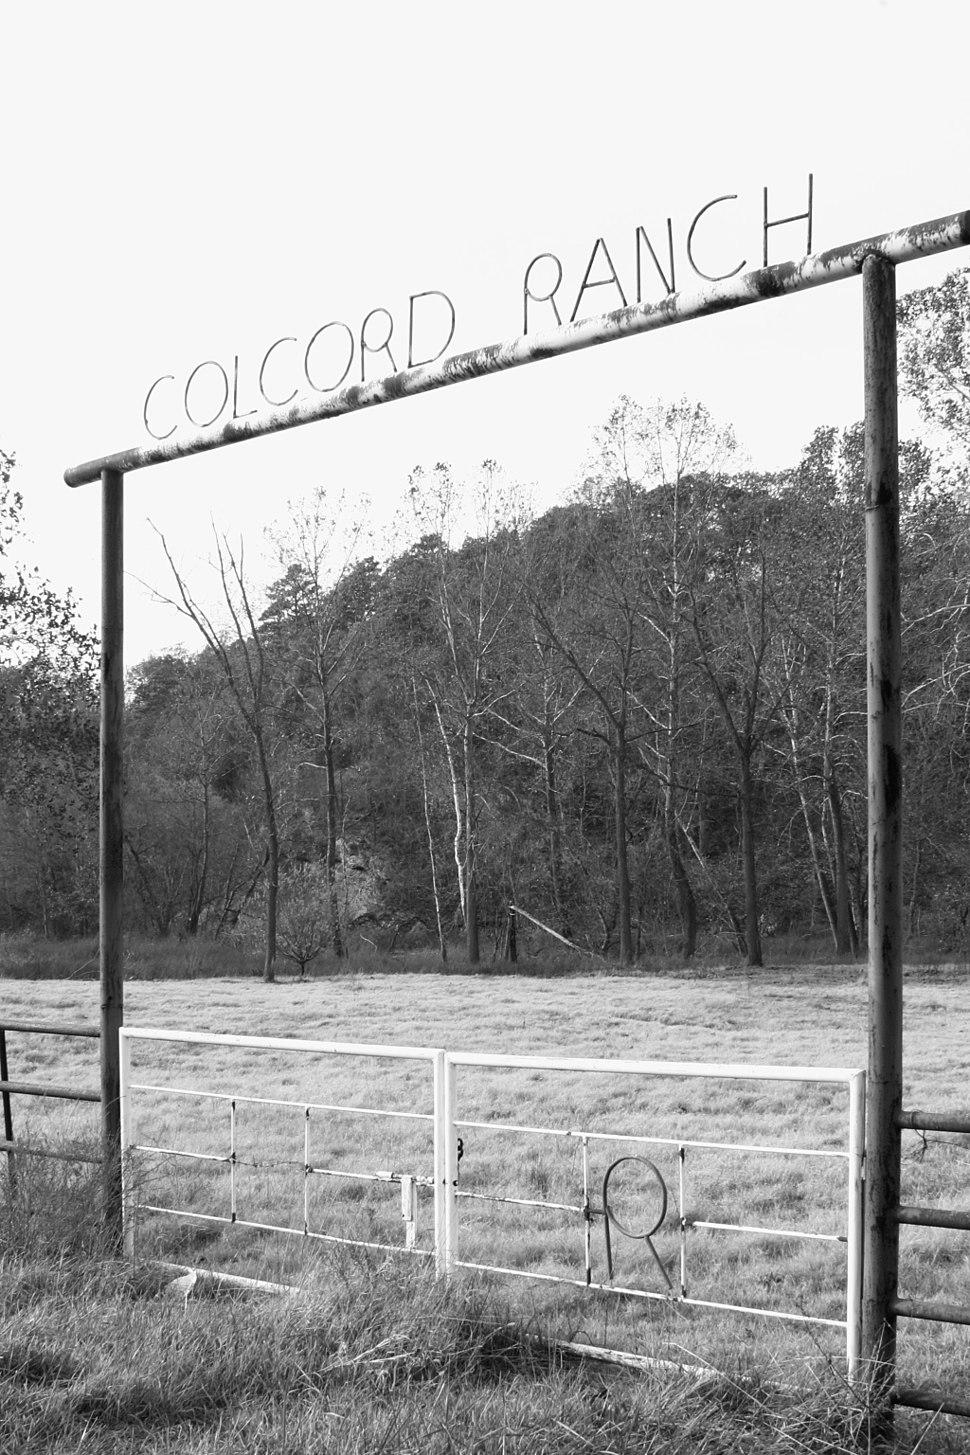 ColcordRanch